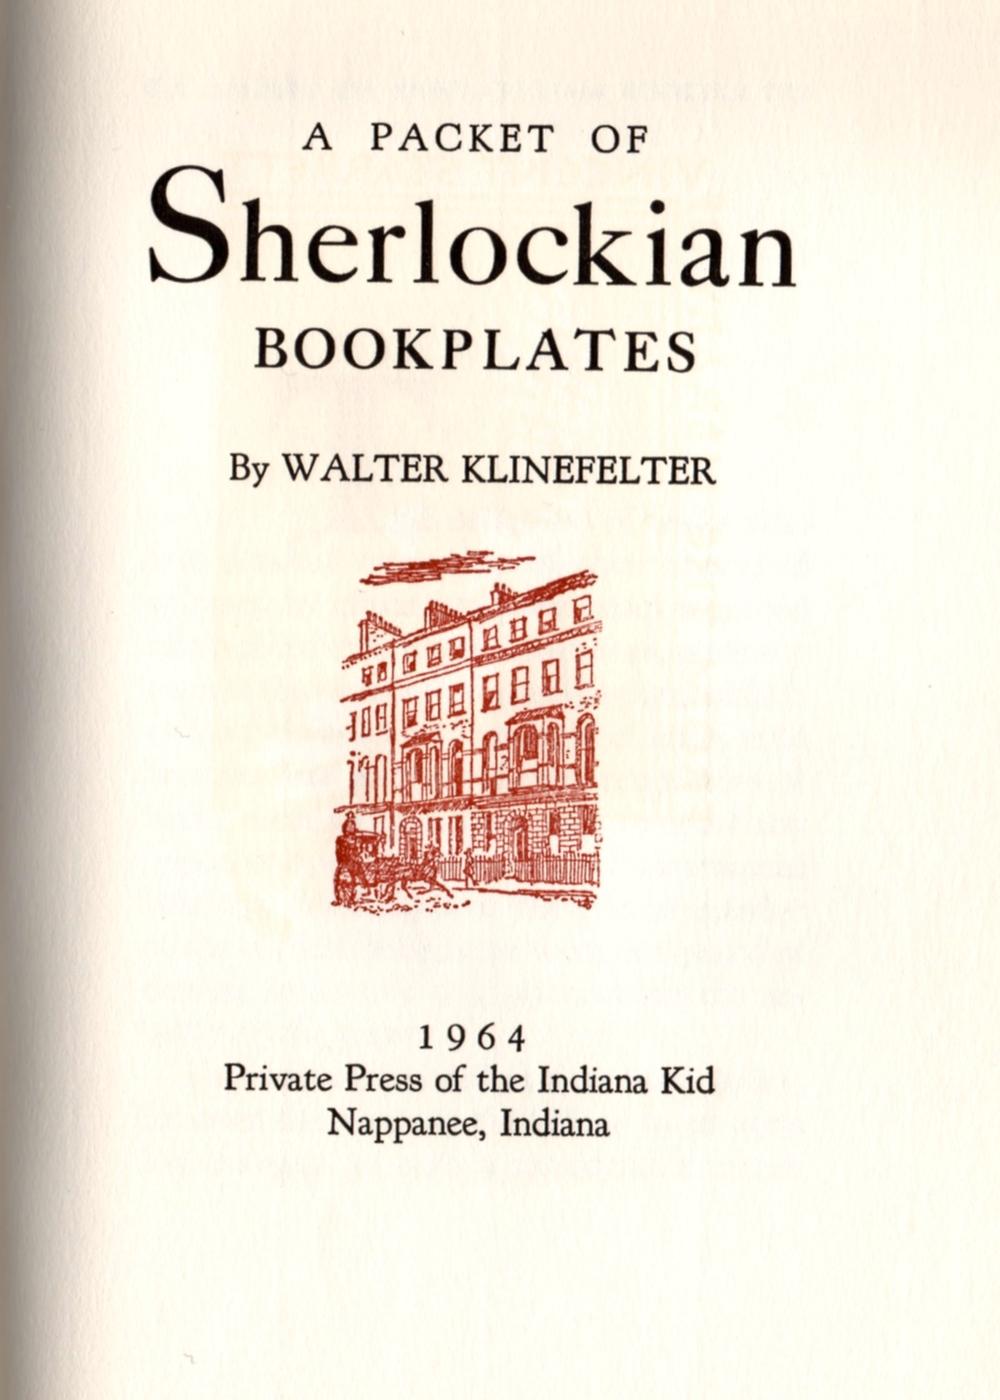 SherlockianBookplatesTitle - Version 2.jpeg